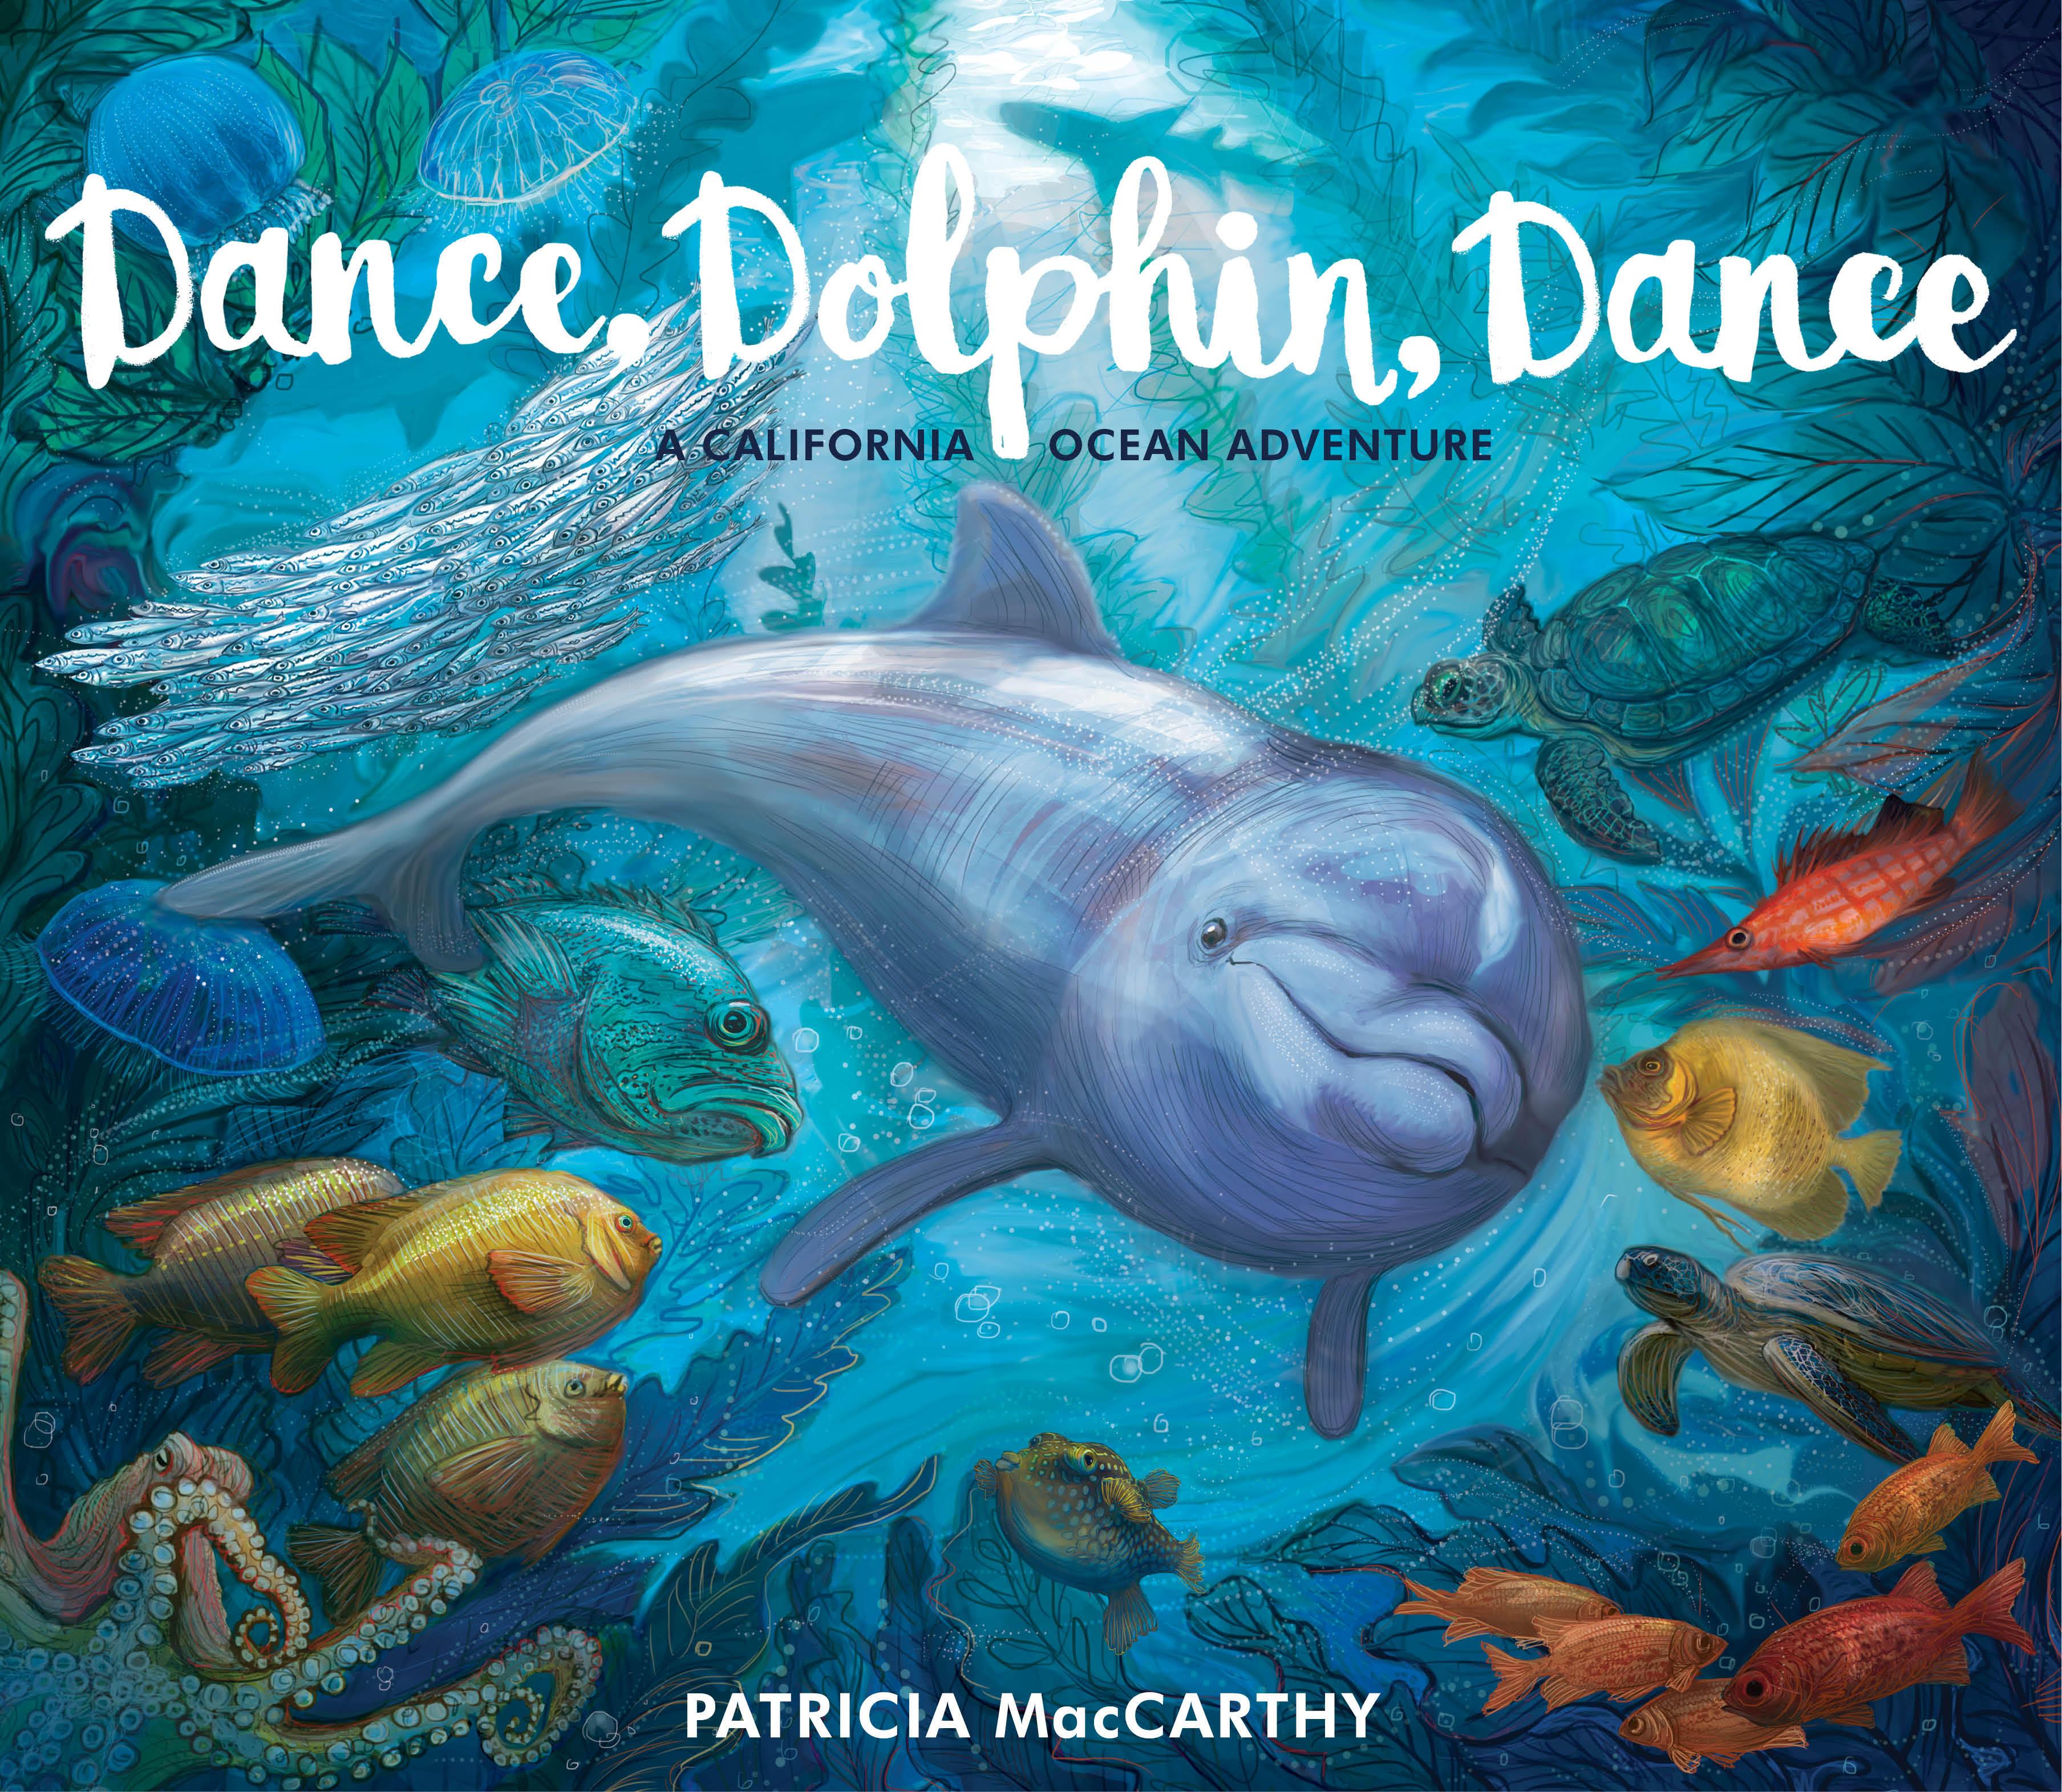 Dance, Dolphin Dance